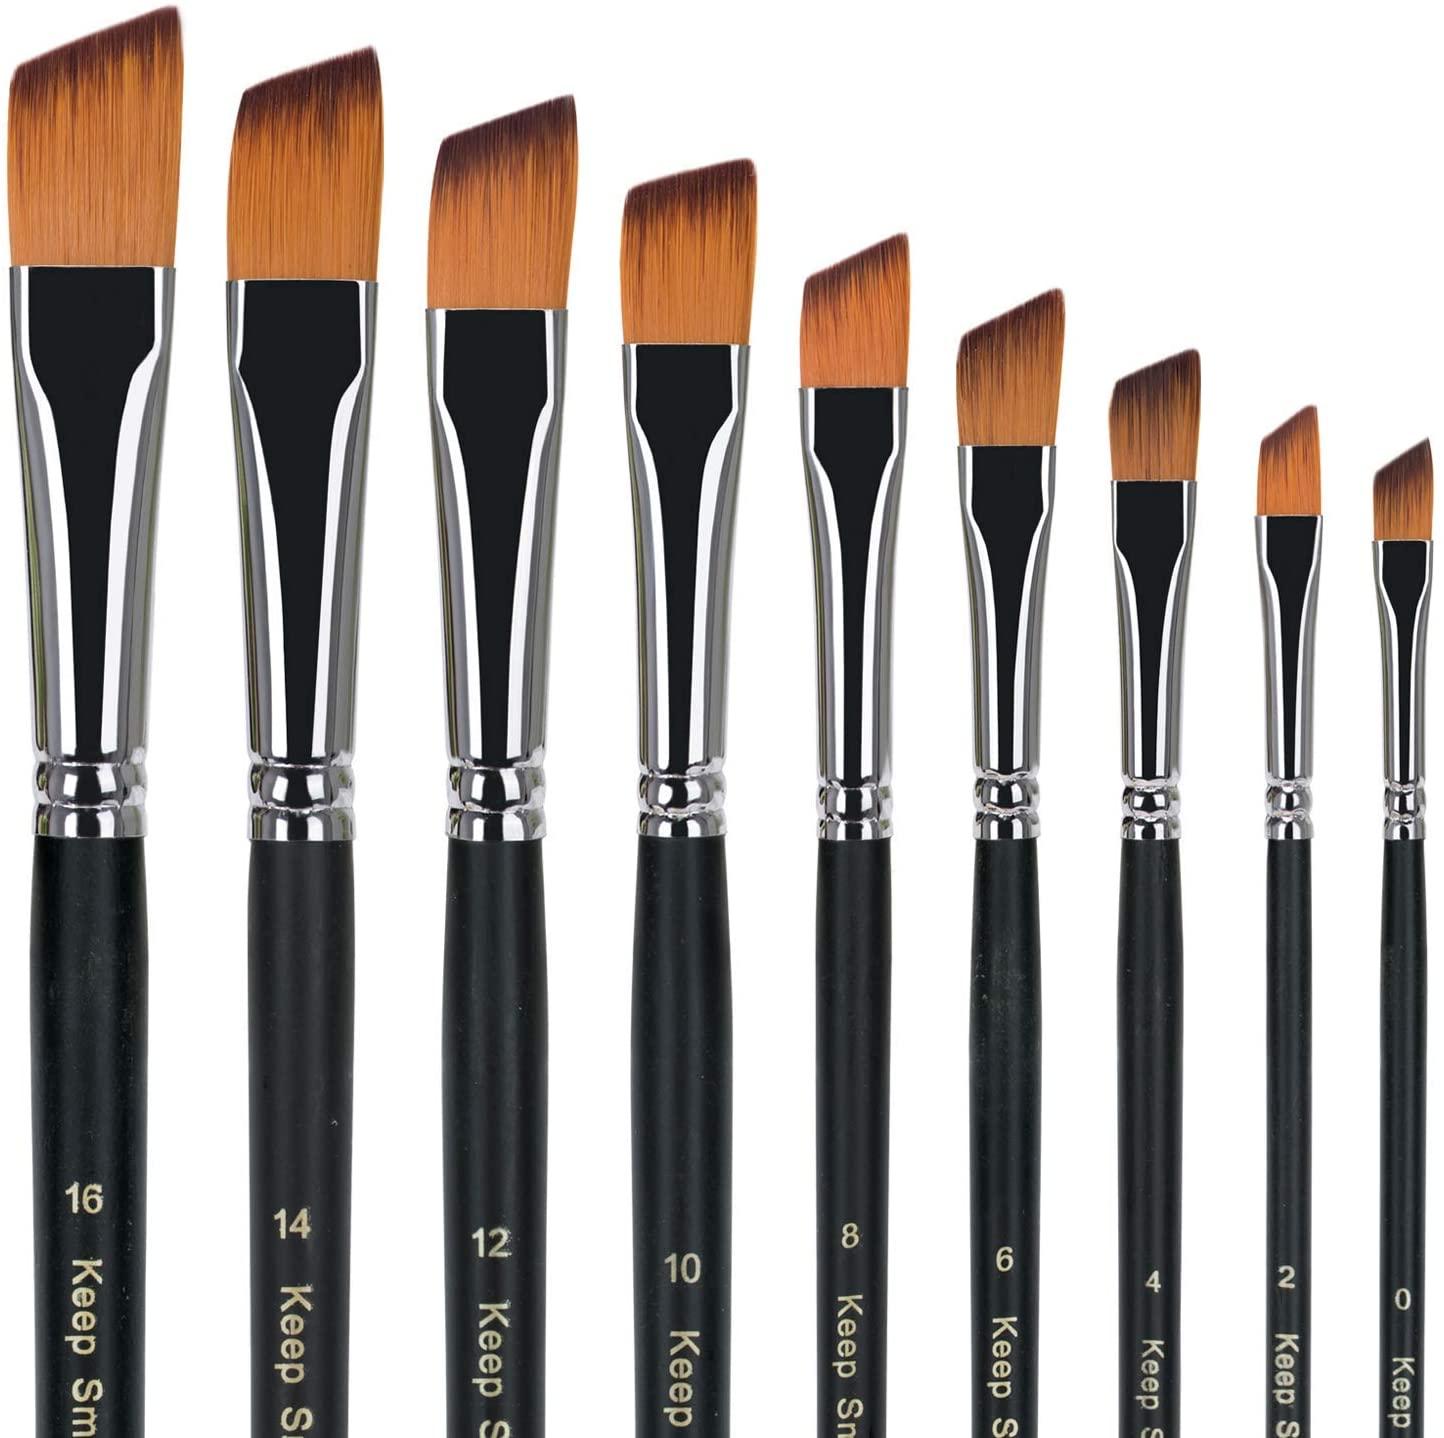 golden maple Artist Paint Brushes Set 9pcs Obilique Tipped Paint Brushes Set for Acrylic Watercolor Oil Painting,Long Handle